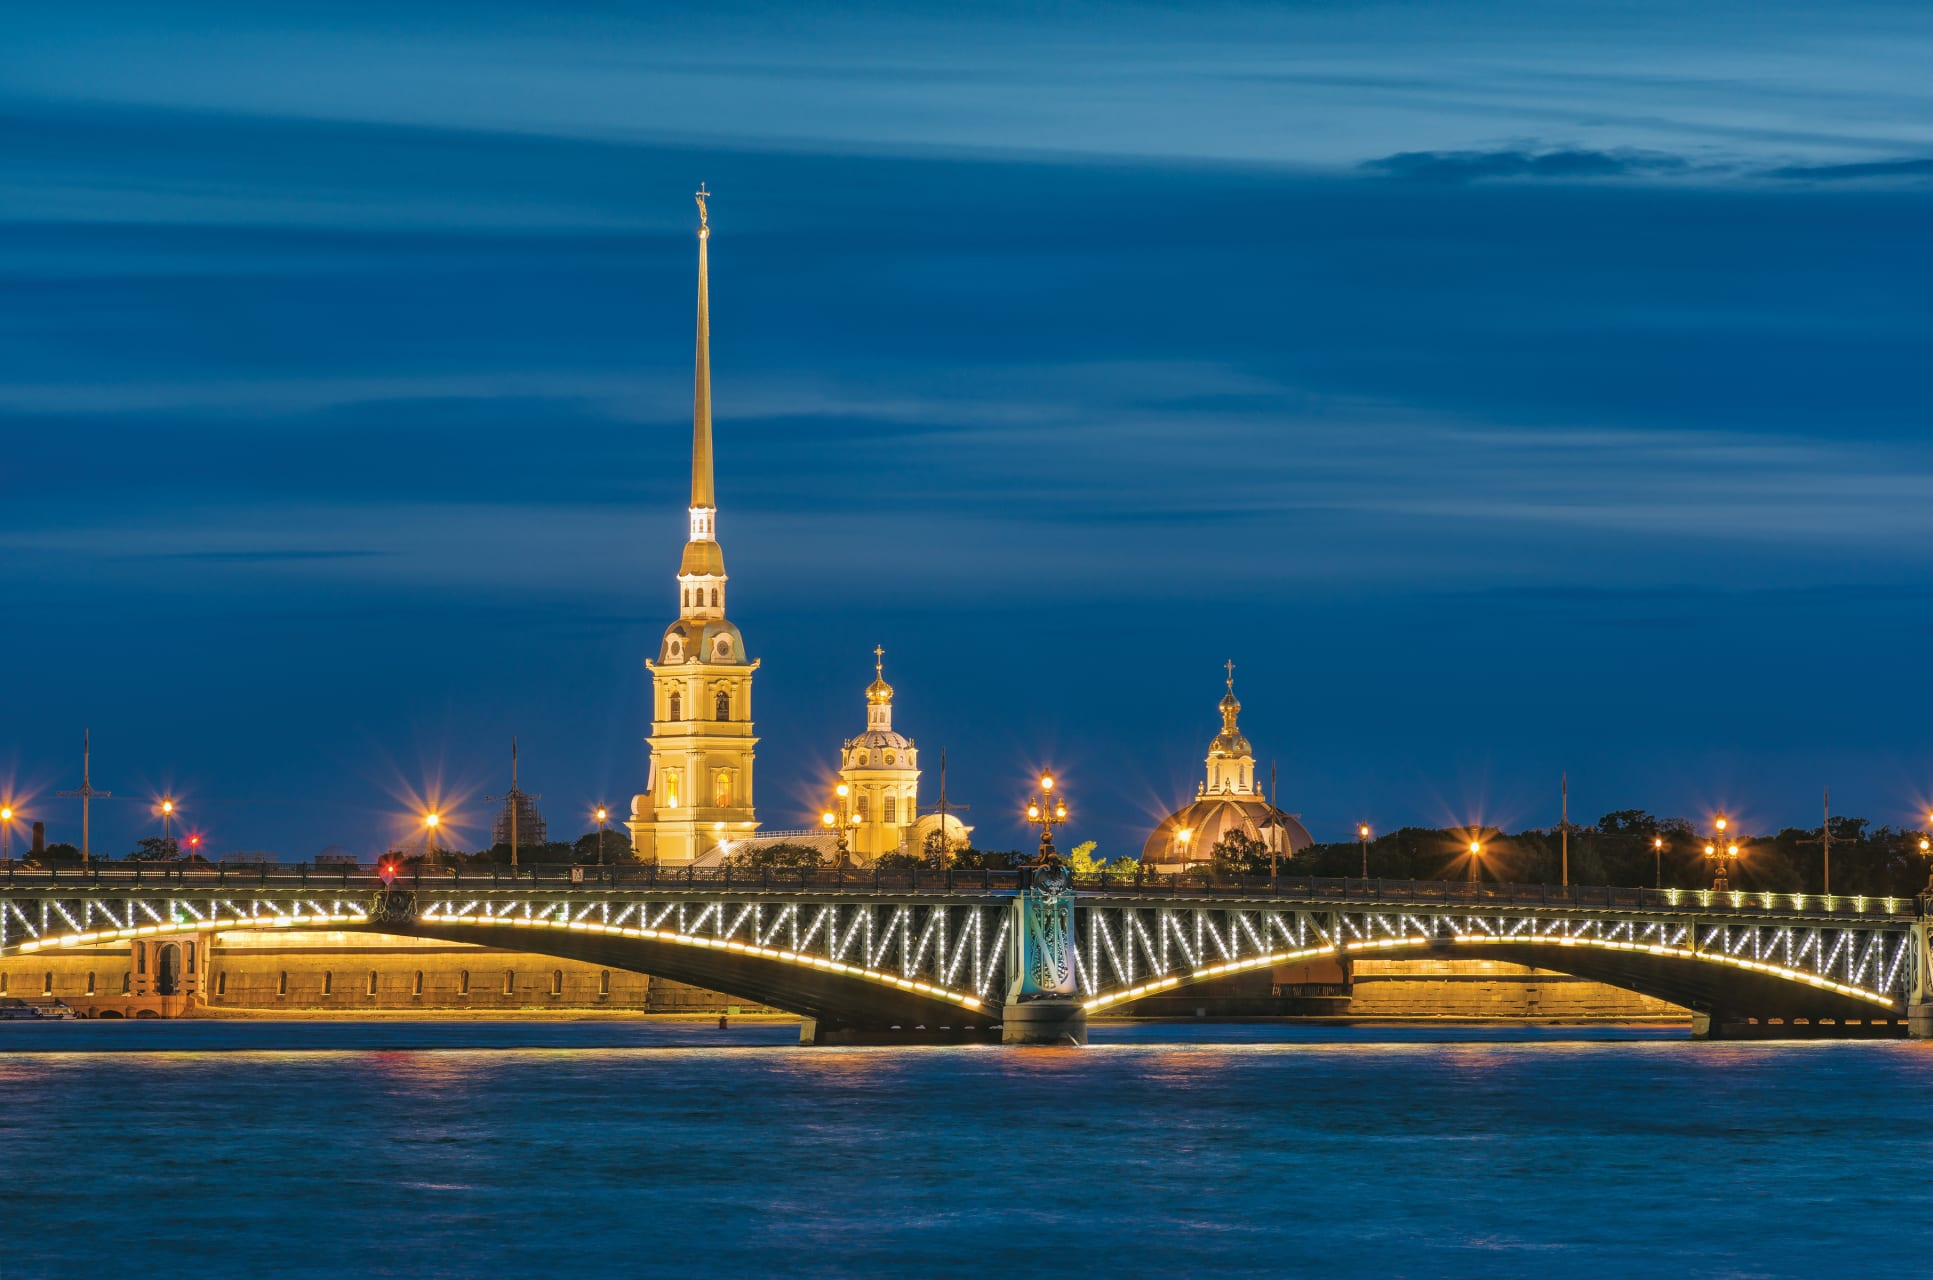 Saint Petersburg - White Nights Special: Bridge opening Part I. Palace Bridge and Trinity Bridge